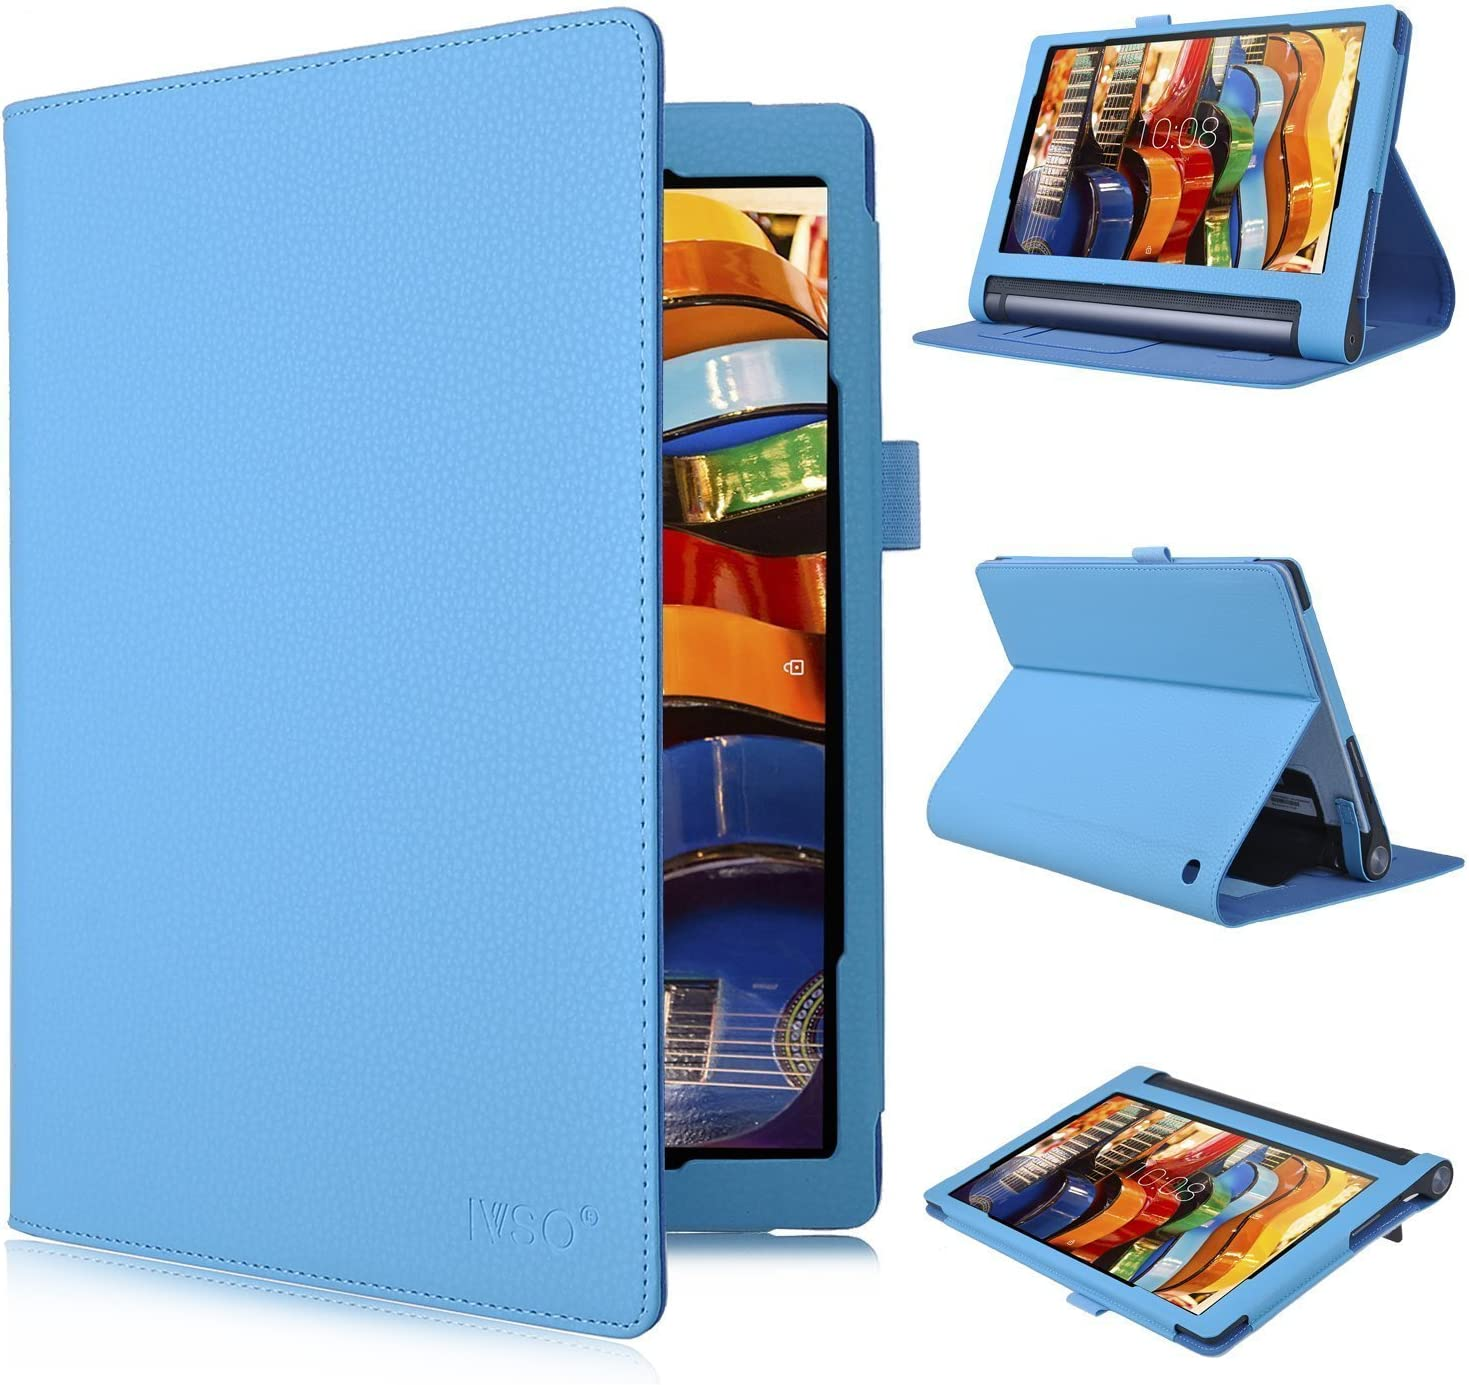 Lenovo Yoga Tab 3 Plus 10 Case Ivso High Quality Pu Amazon De Computers Accessories